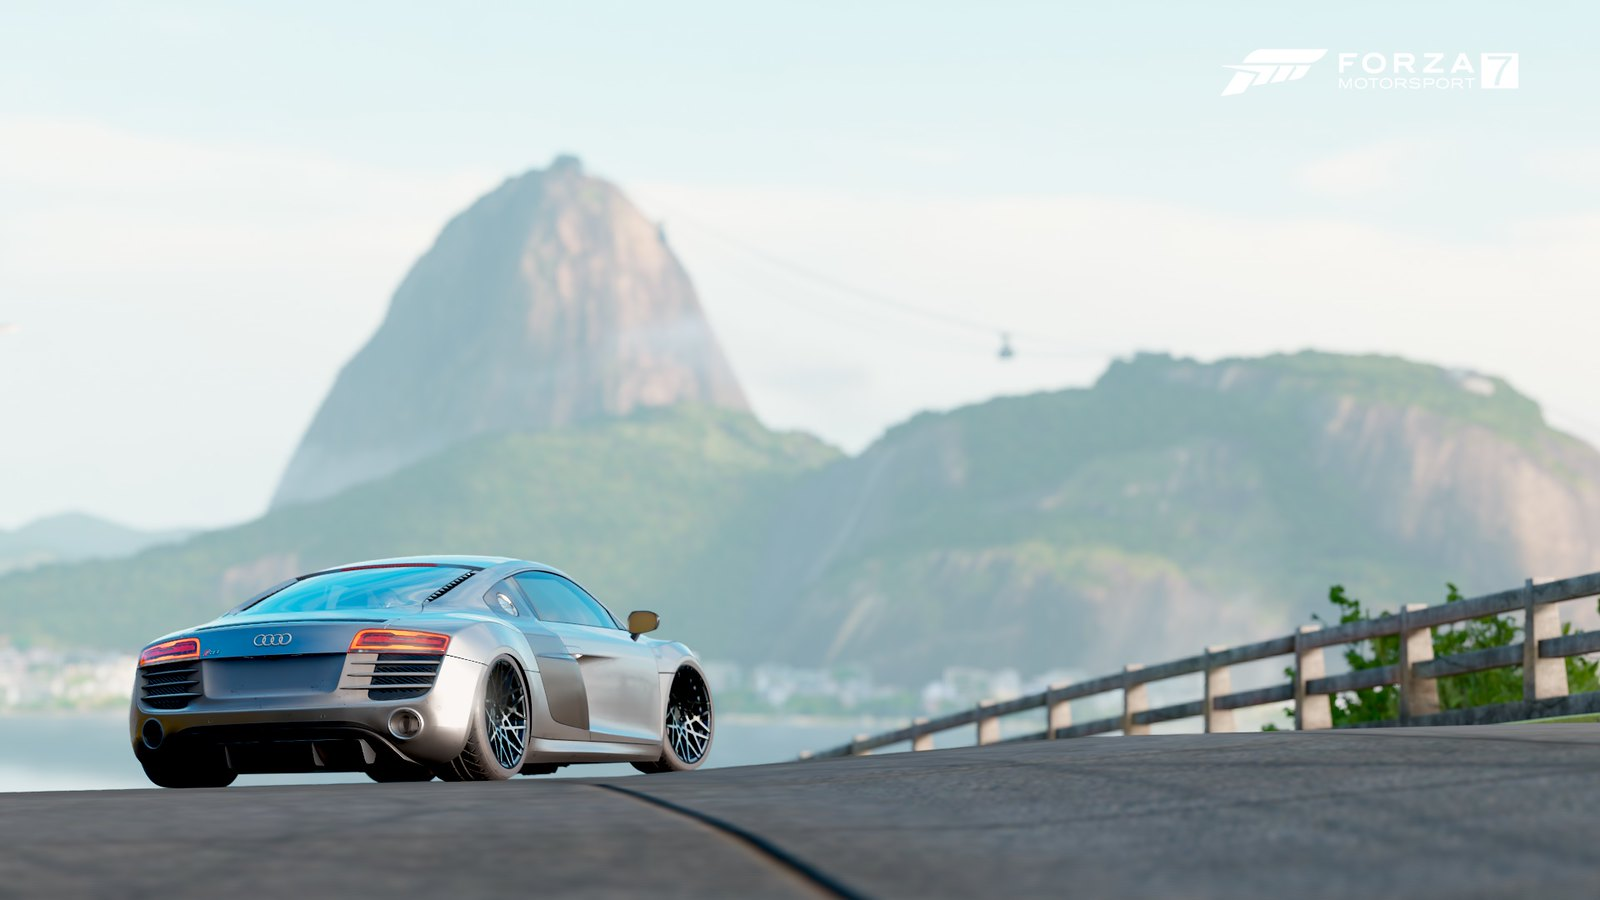 26790432528_50bf3c7bef_h ForzaMotorsport.fr